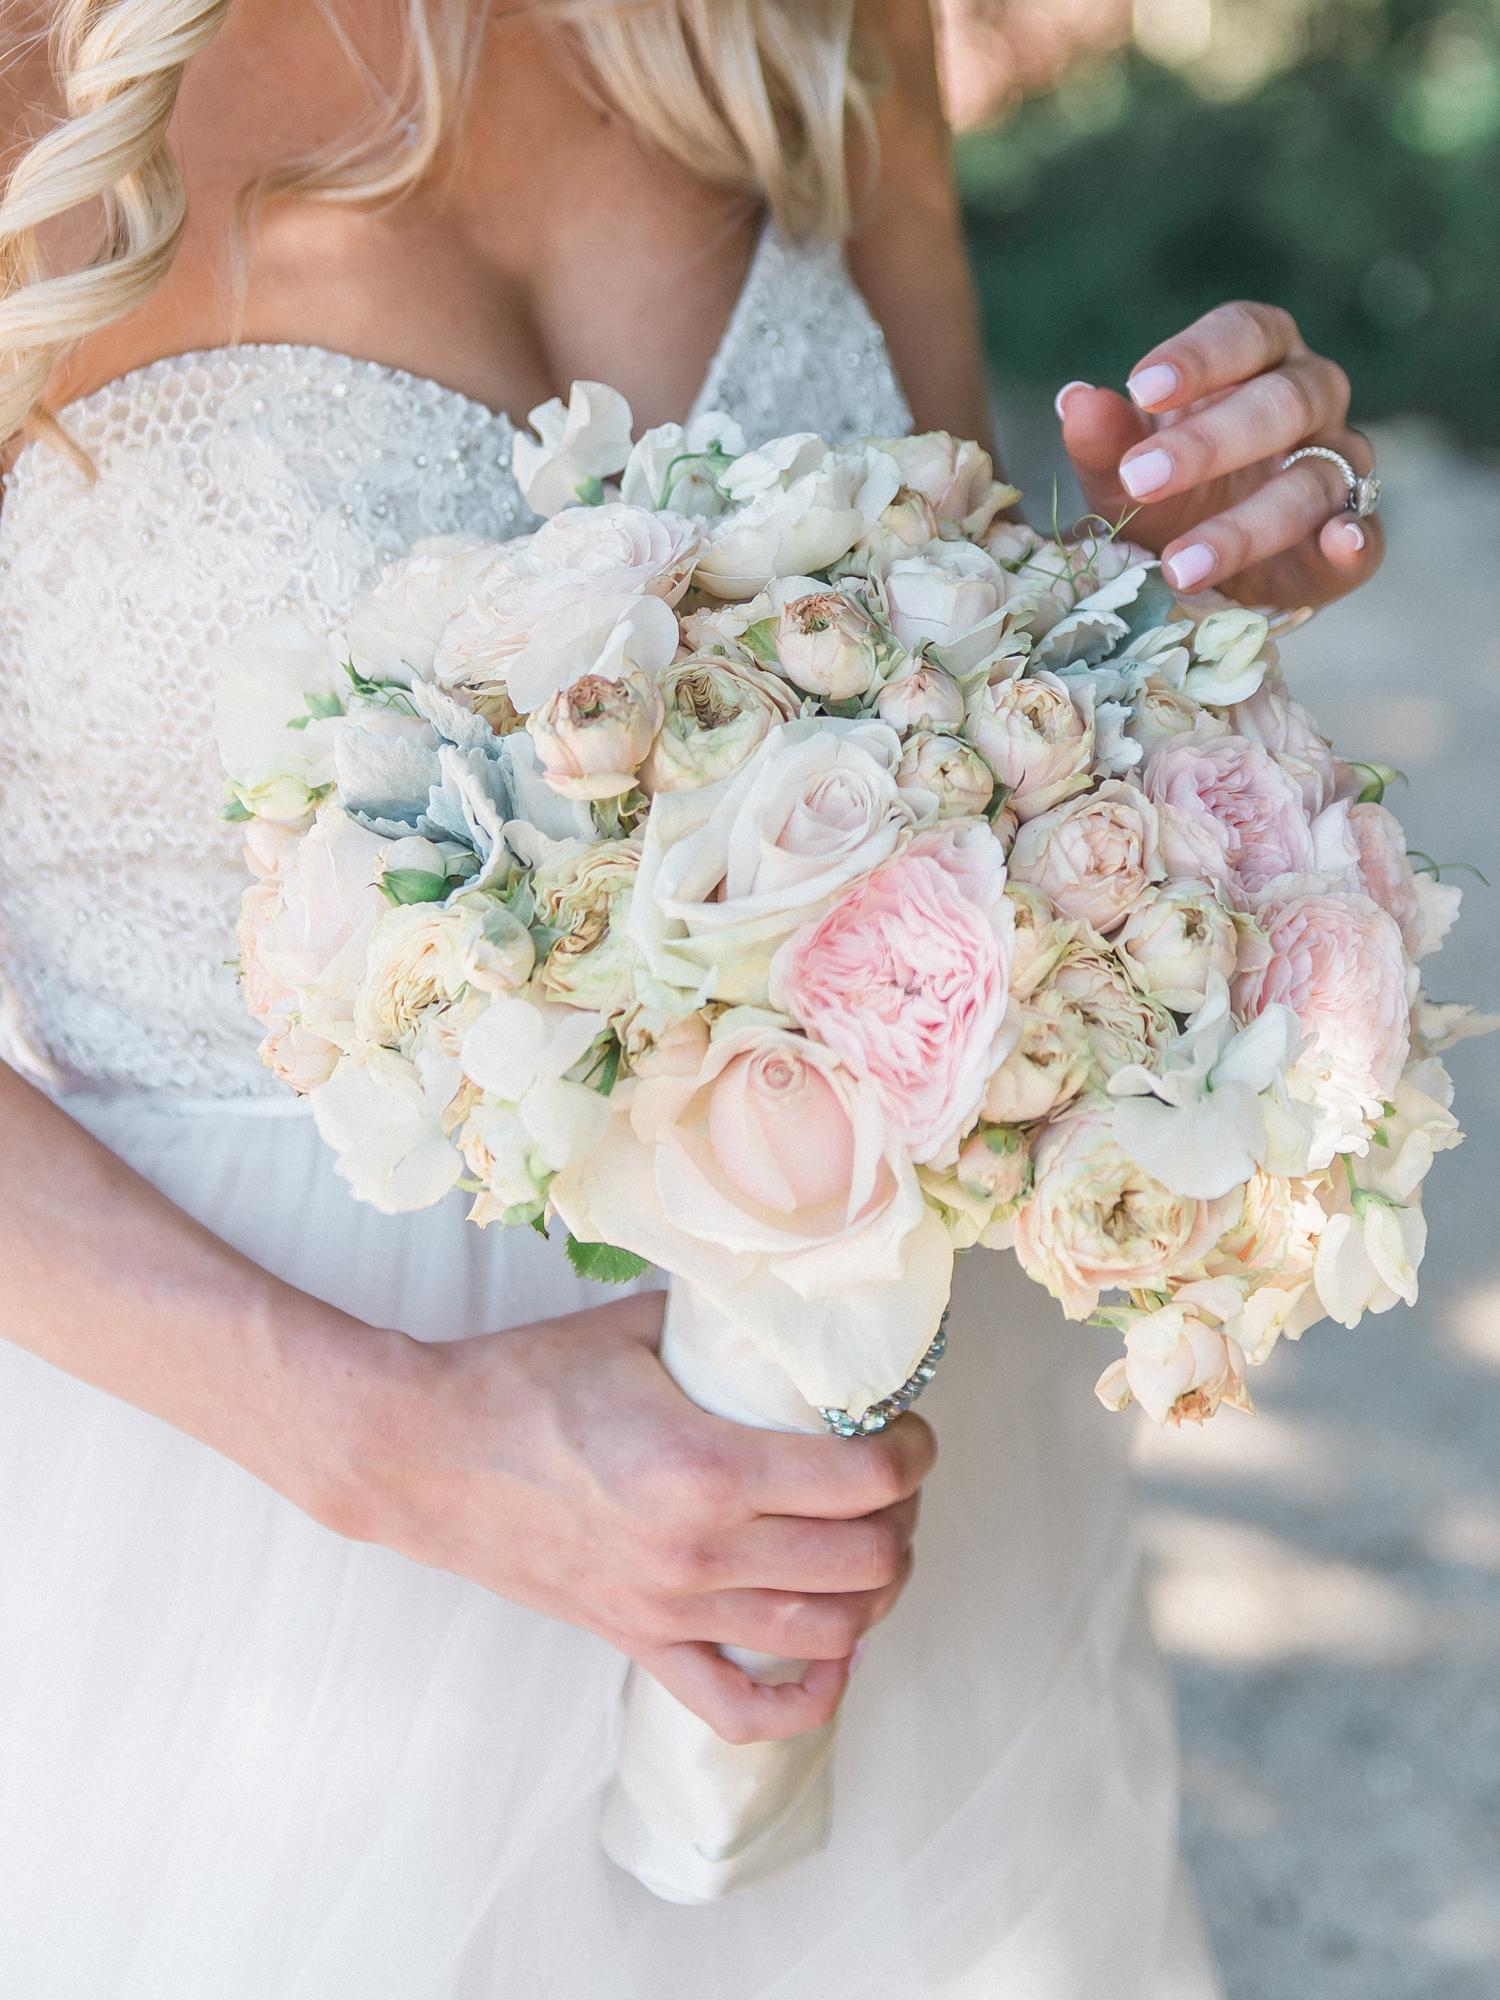 Aimee+Logan_wedding_spp-46.jpg